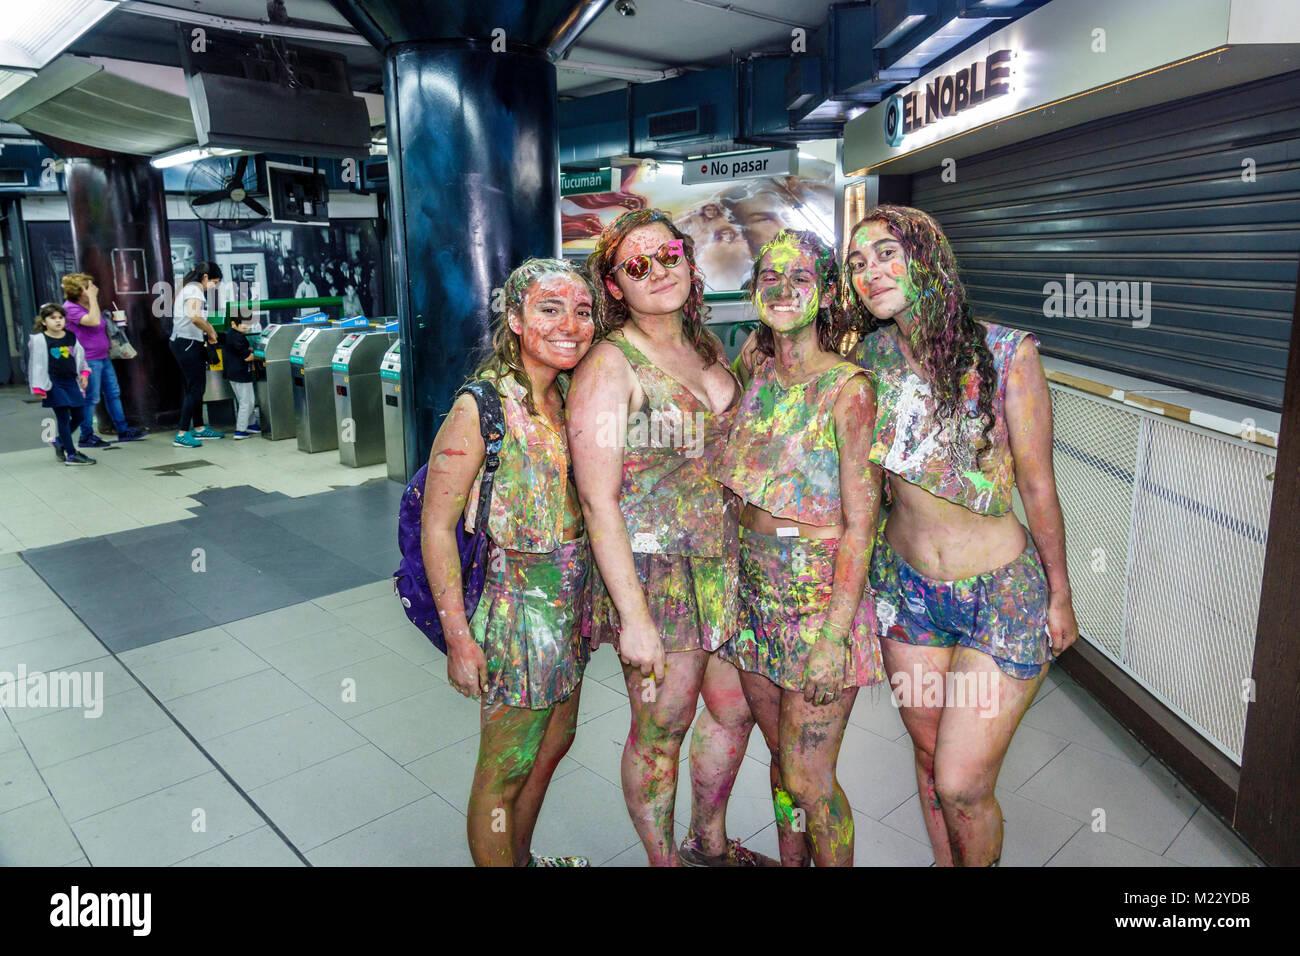 Buenos Aires Argentina Subte subway public transportation Tribunales station teen girl student friends splattered - Stock Image